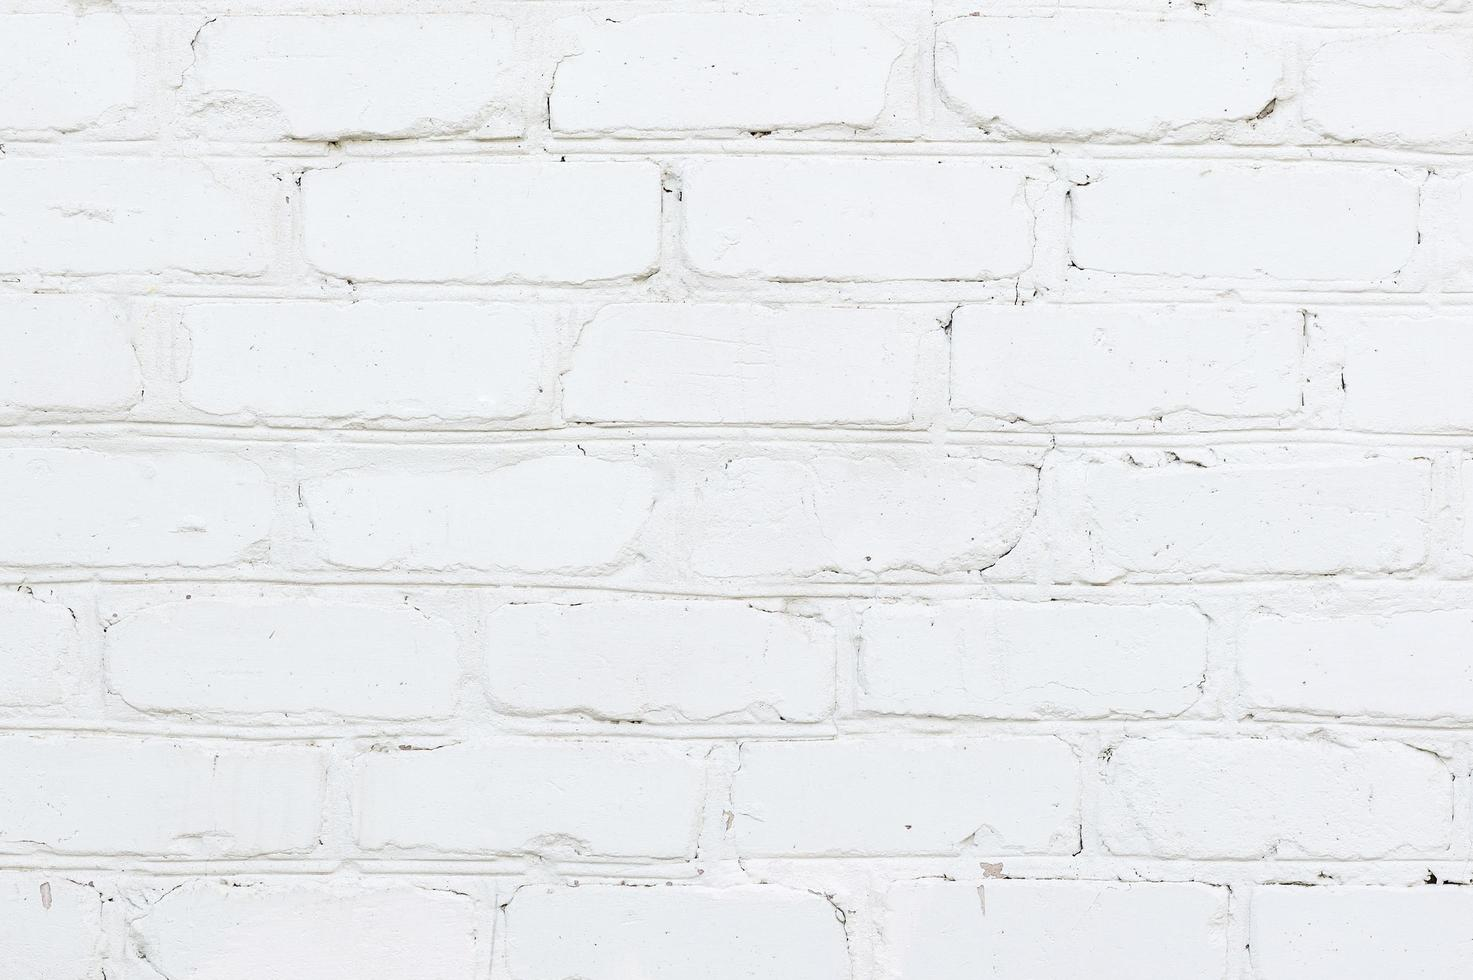 textura de pared de ladrillo blanco moderno foto